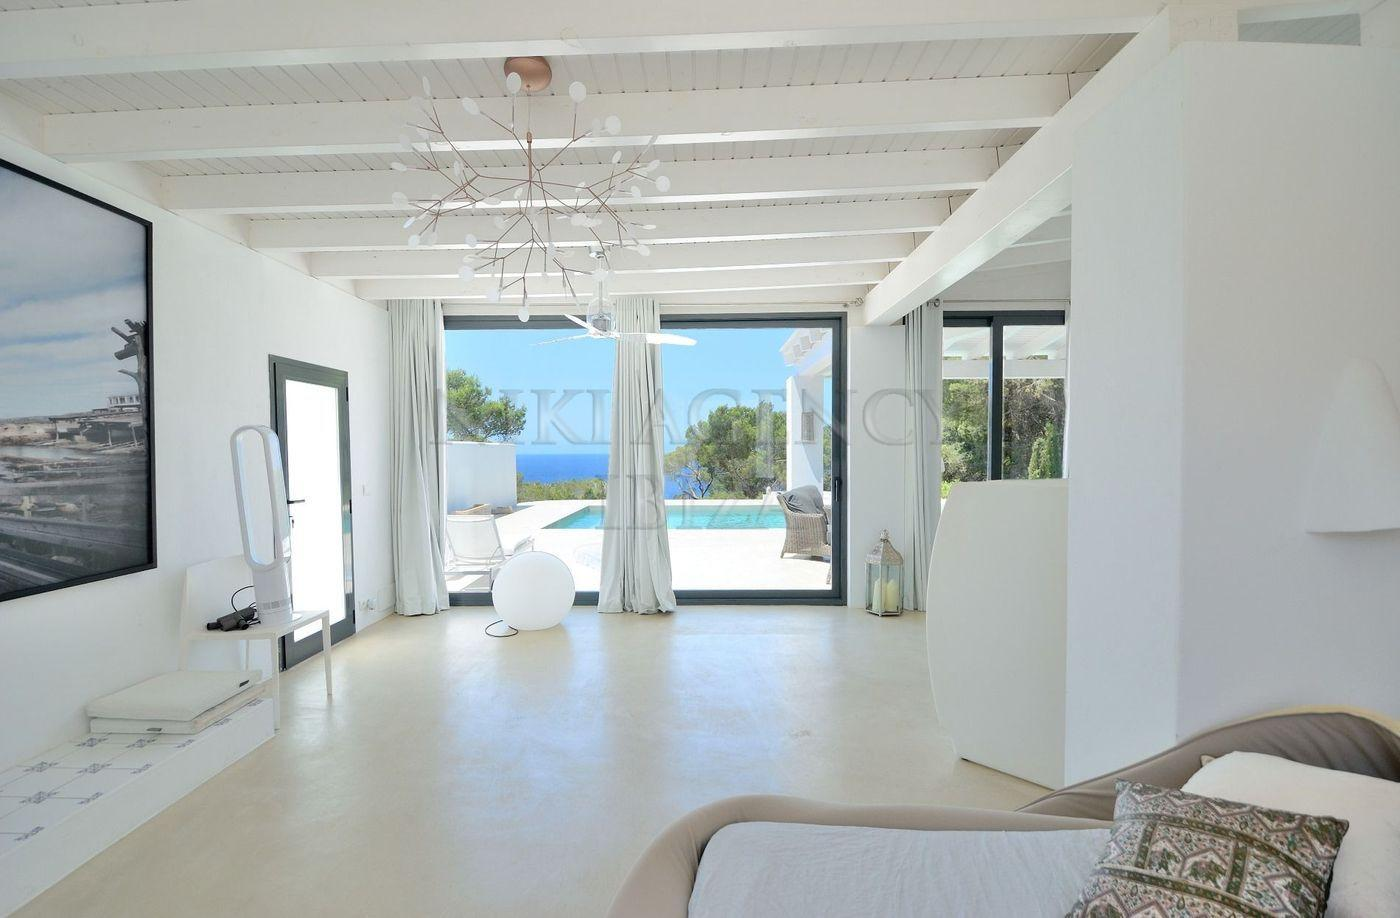 13. House for sale in Sant Josep de sa Talaia Ibiza - Fantastic 4 Bed Villa For Sale in Sant Josep de sa Talaia, Ibiza!